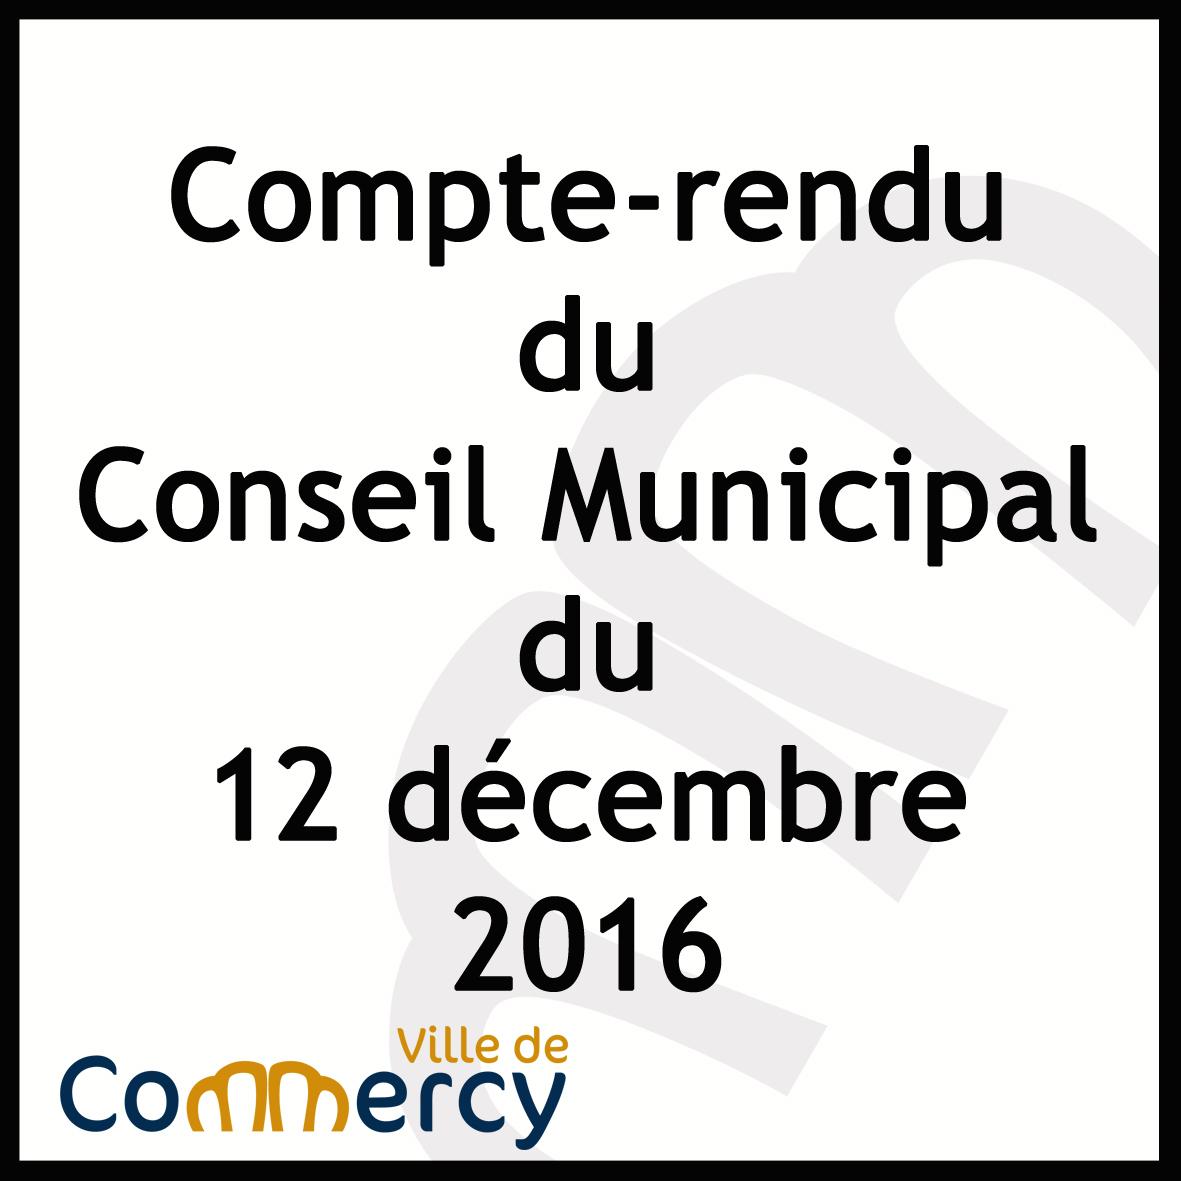 CRCM_20161212